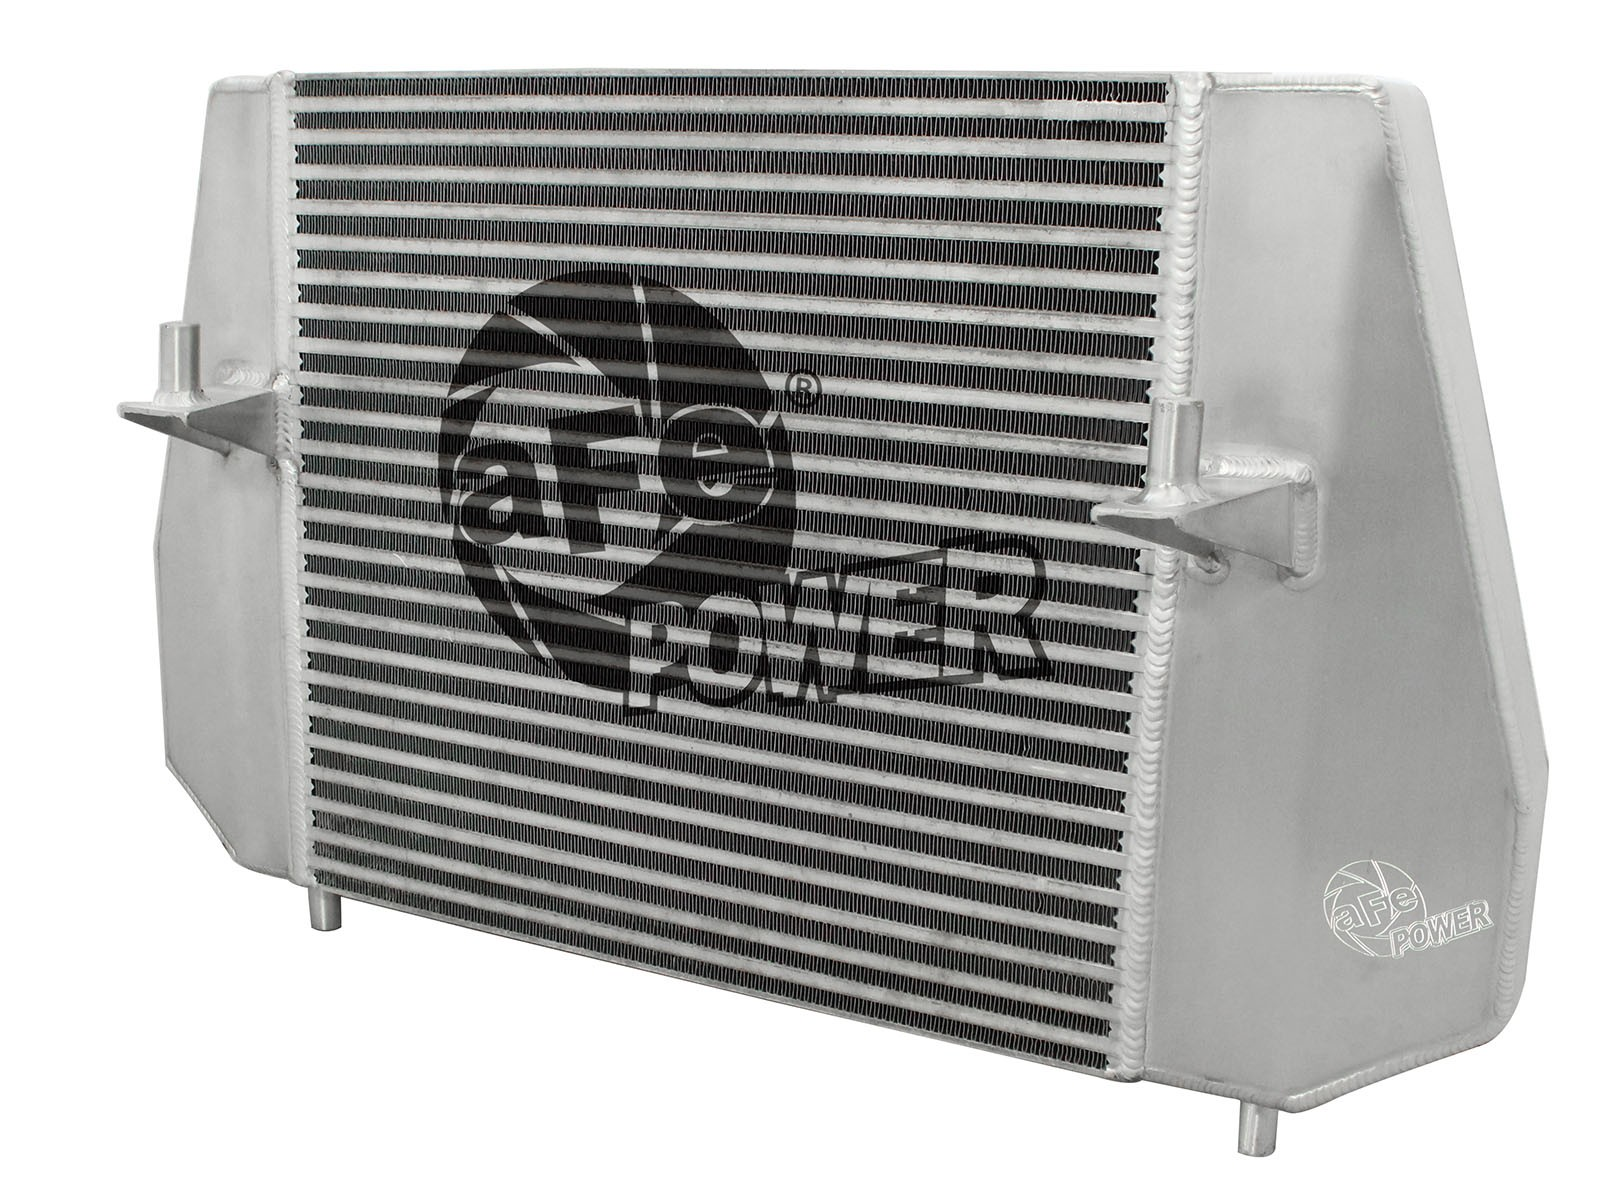 aFe POWER 46-20121-1 BladeRunner GT Series Intercooler